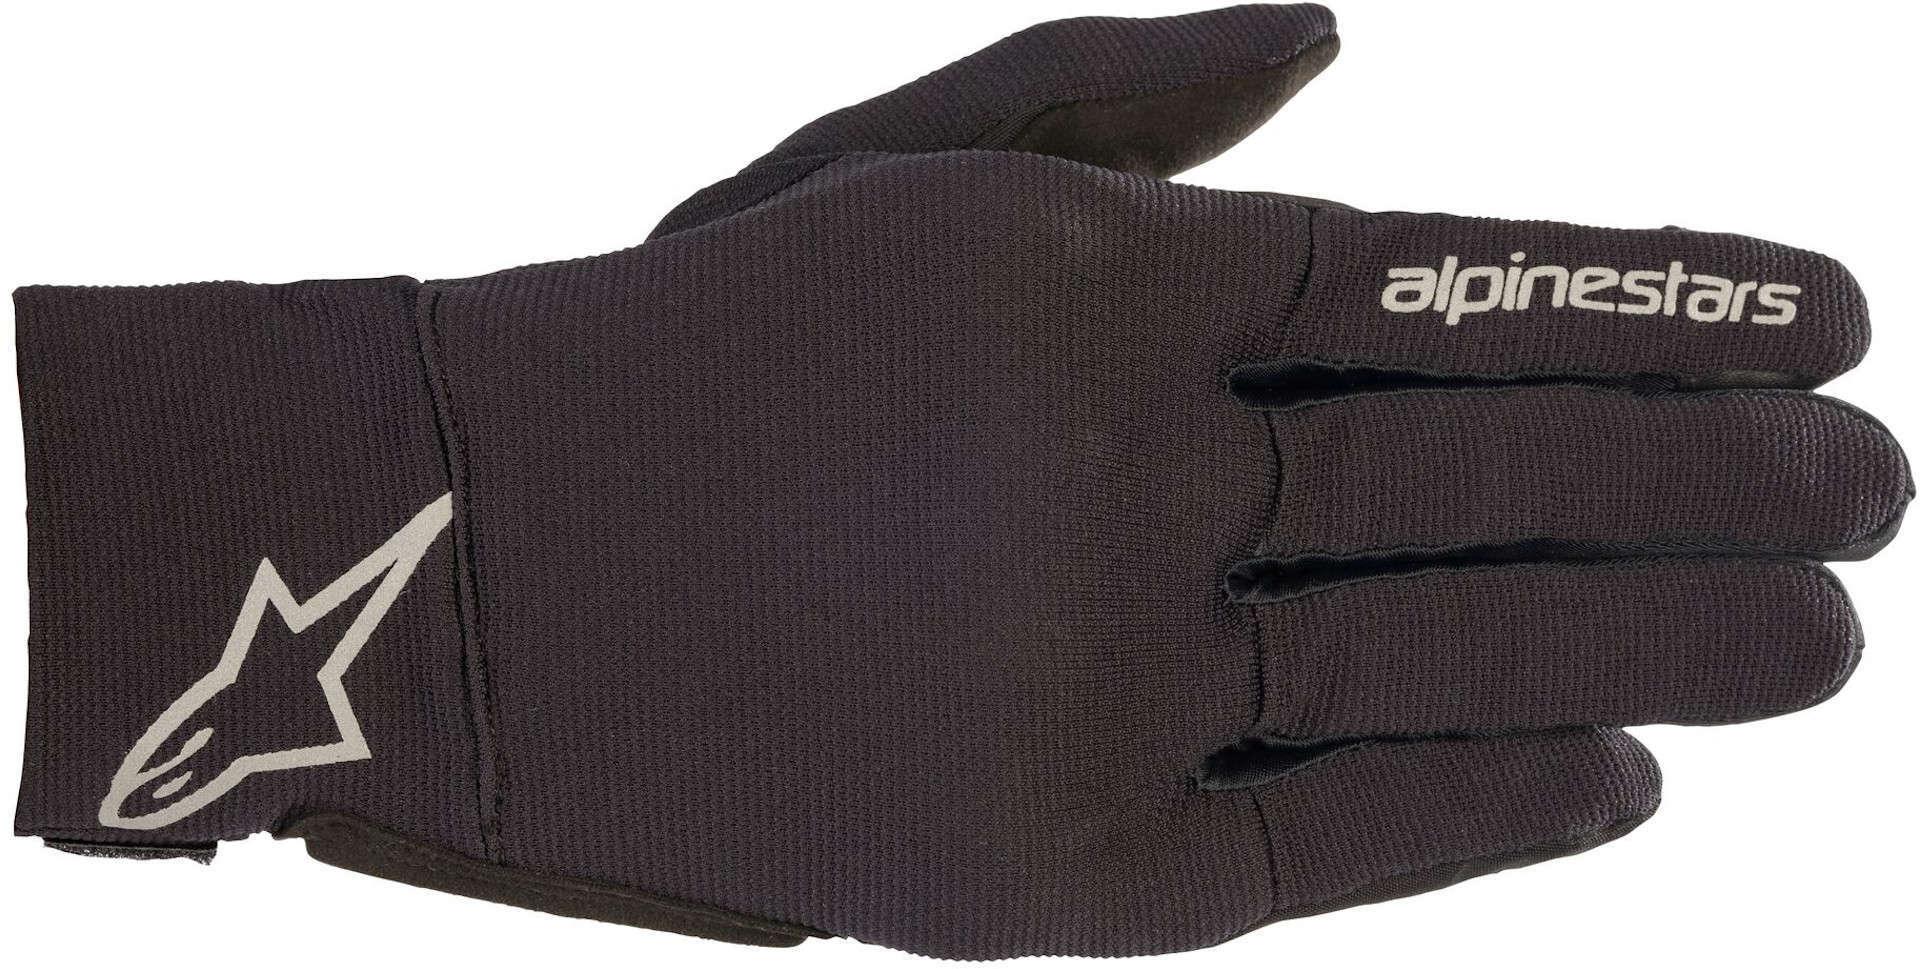 Alpinestars Reef Motorrad Handschuhe, schwarz-grau, Größe 2XL, schwarz-grau, Größe 2XL